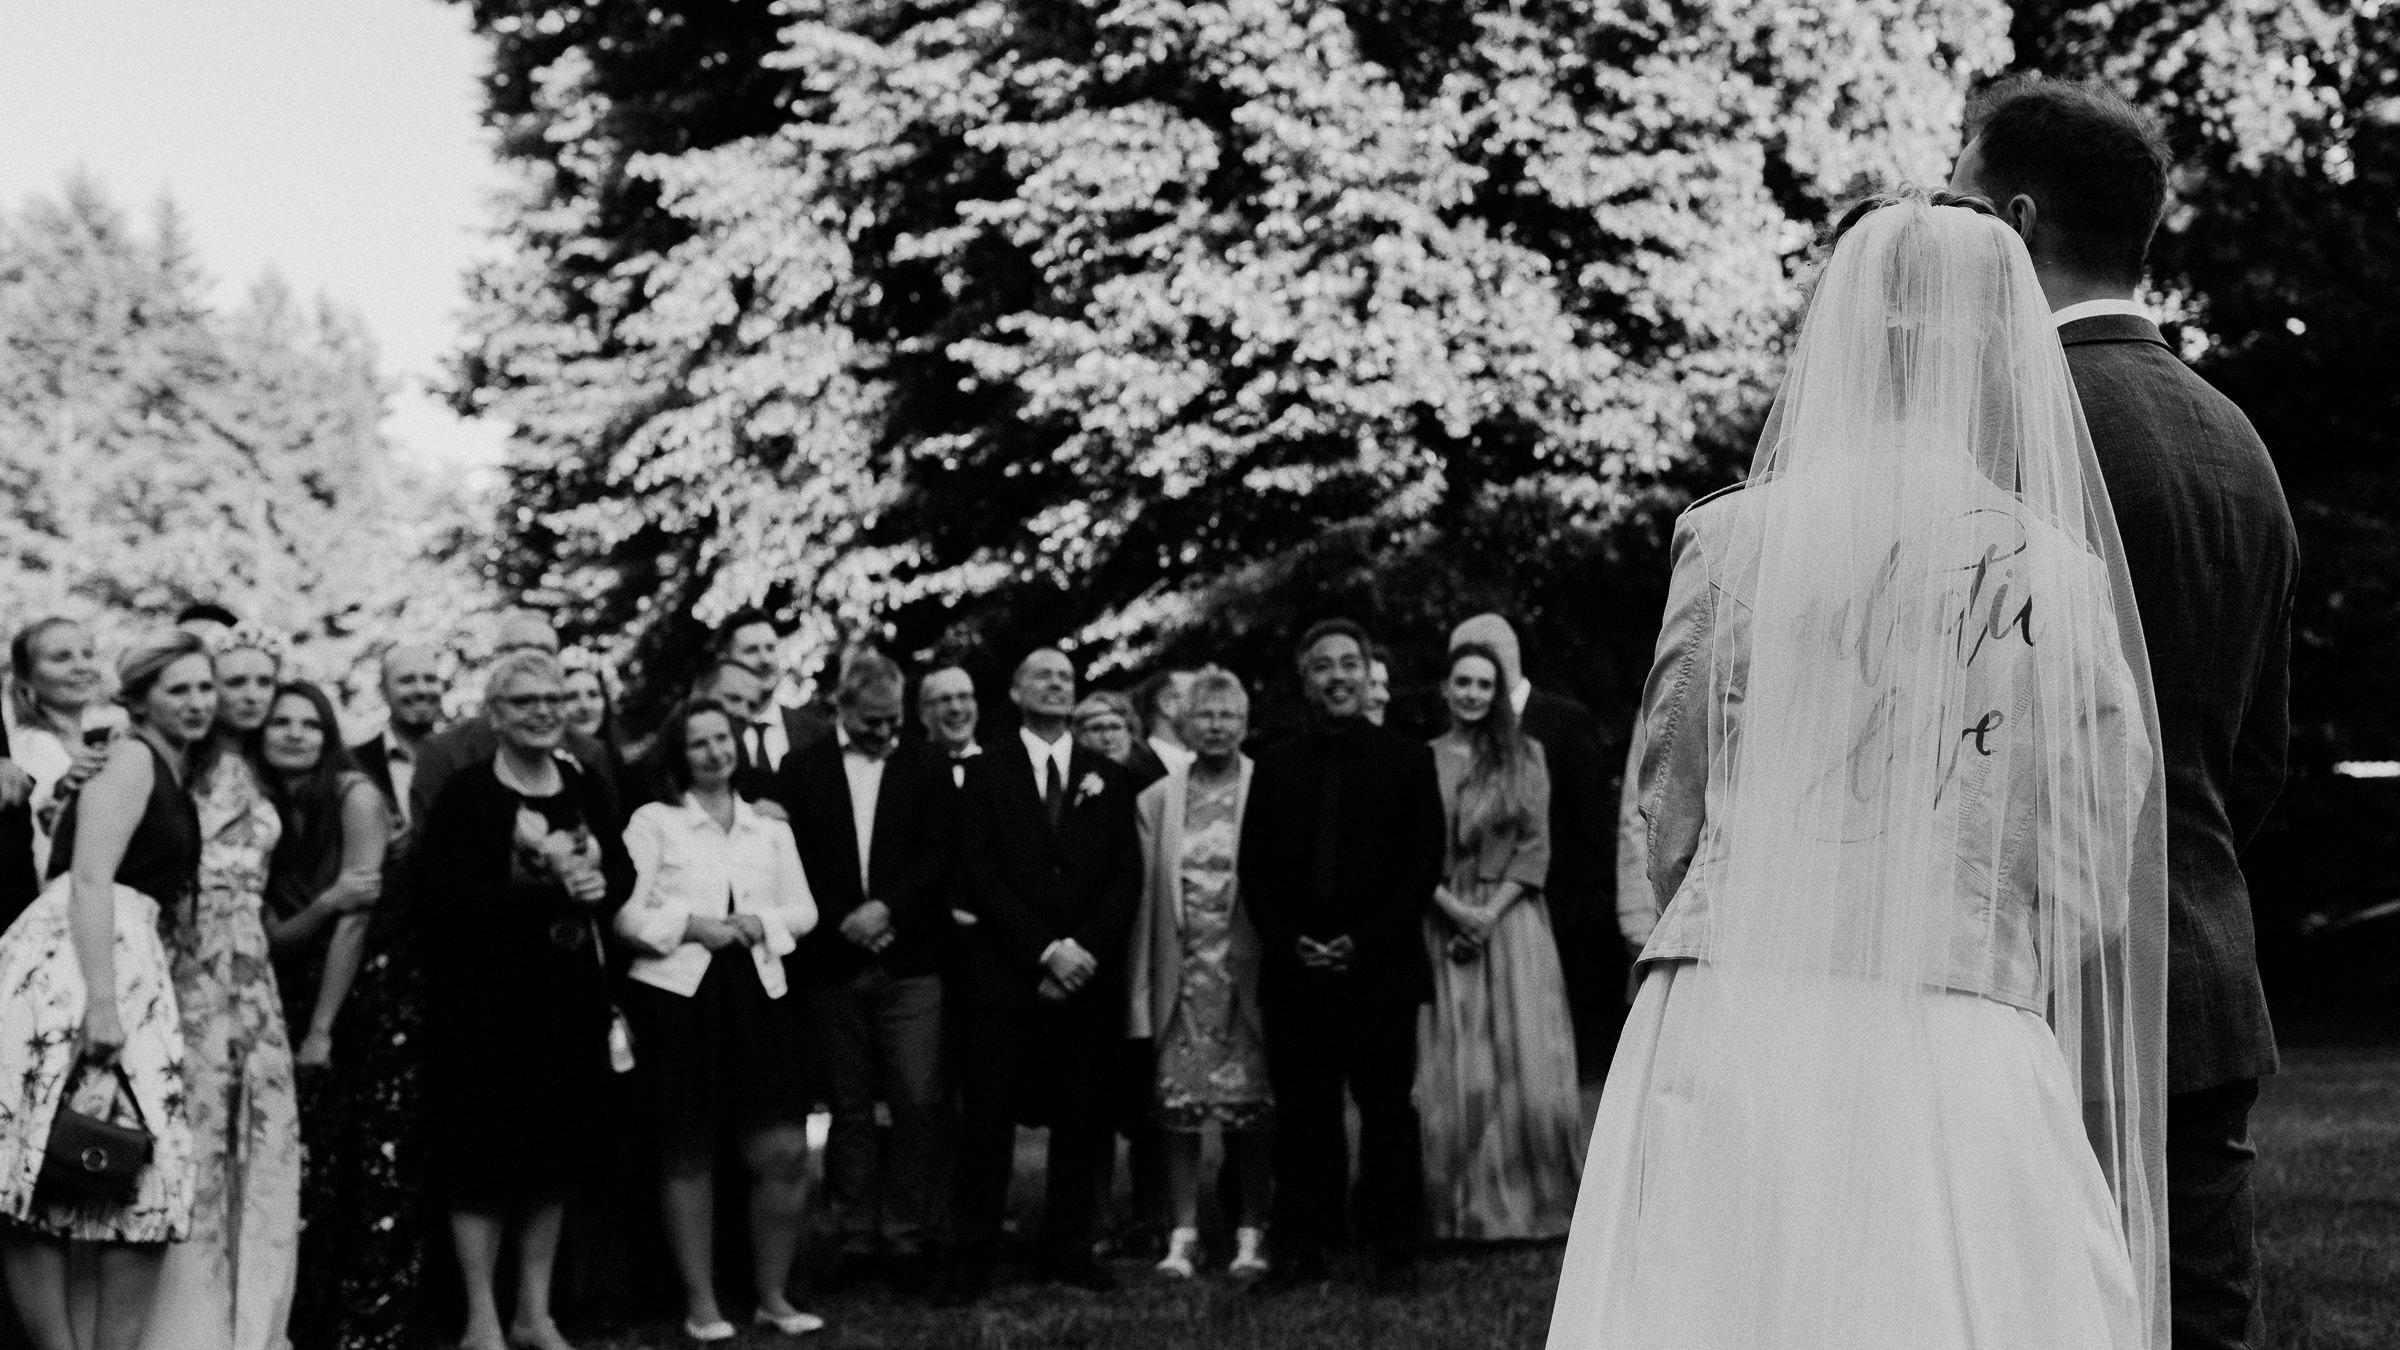 Hochzeitsfotograf Hamburg Waldhof Moelln 0053